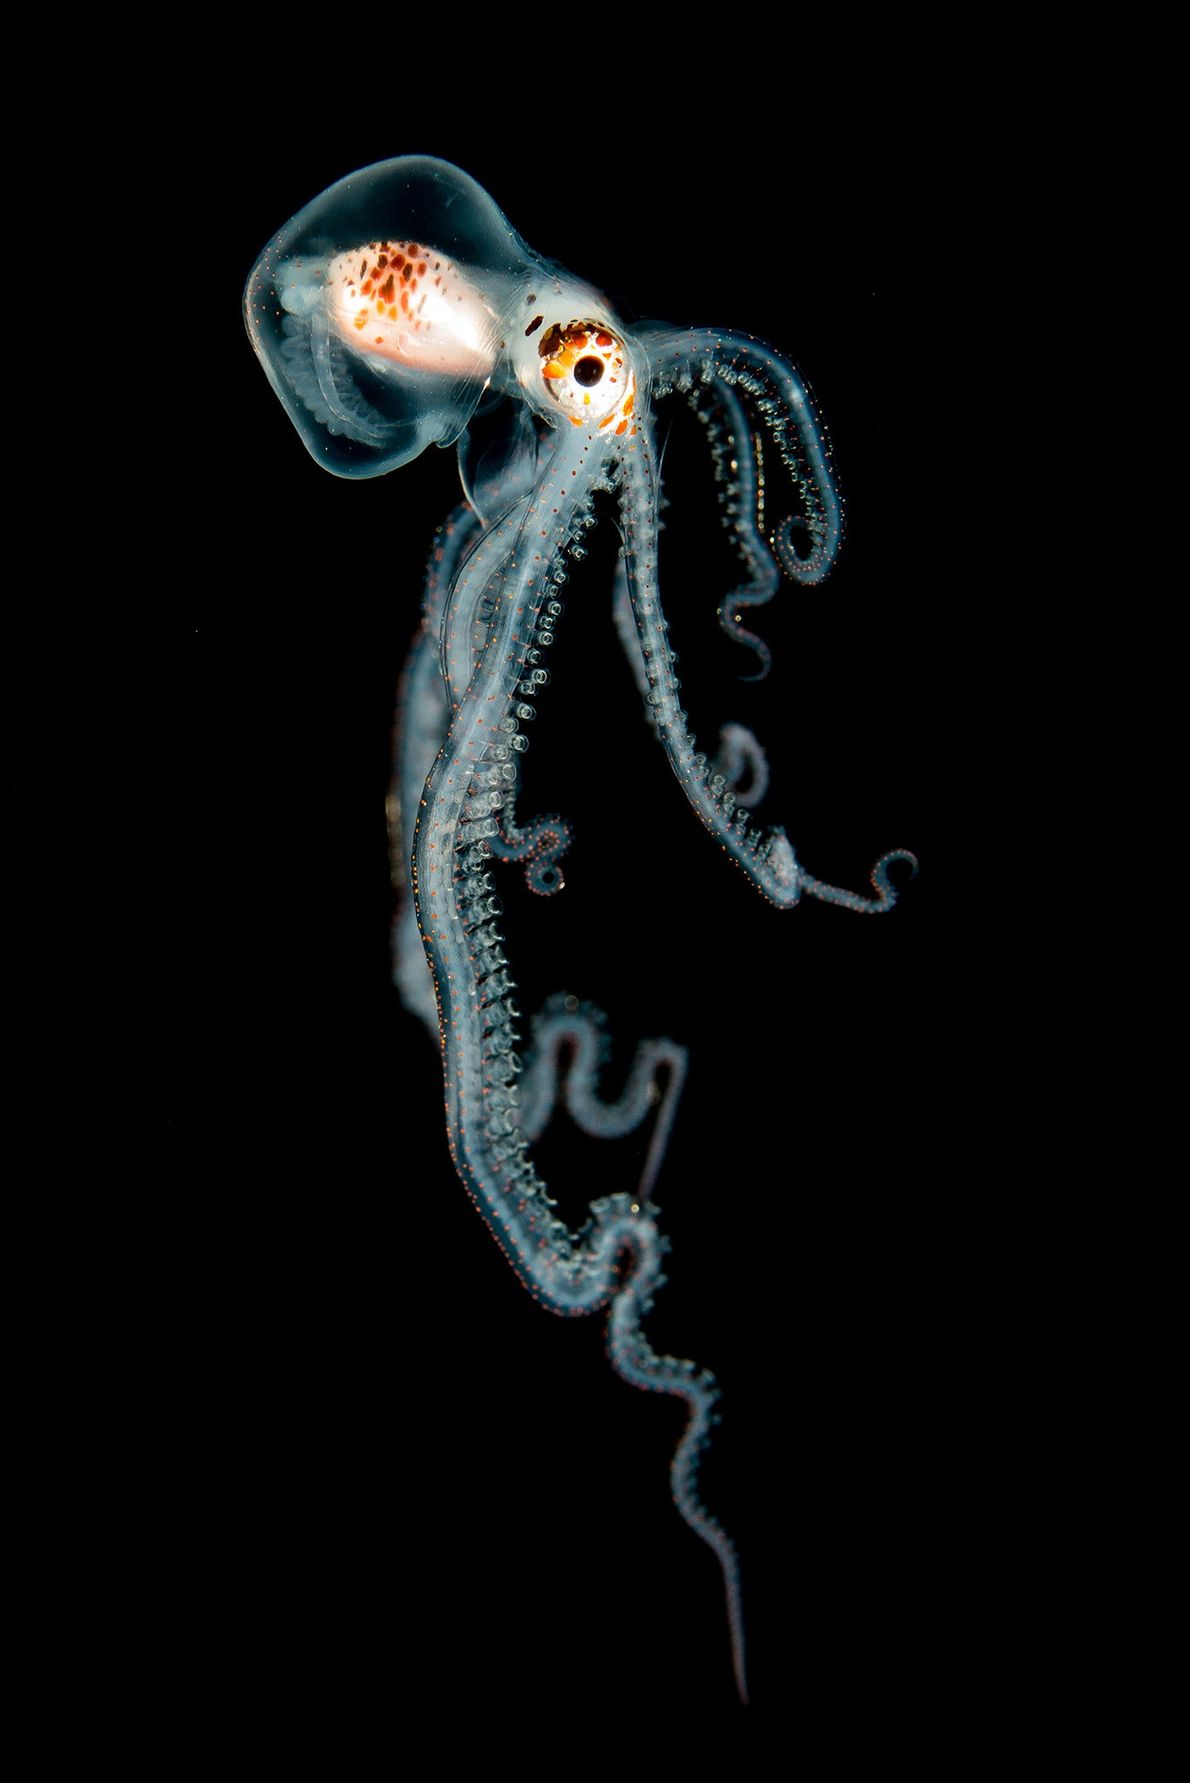 Pelagic Octopus at Night